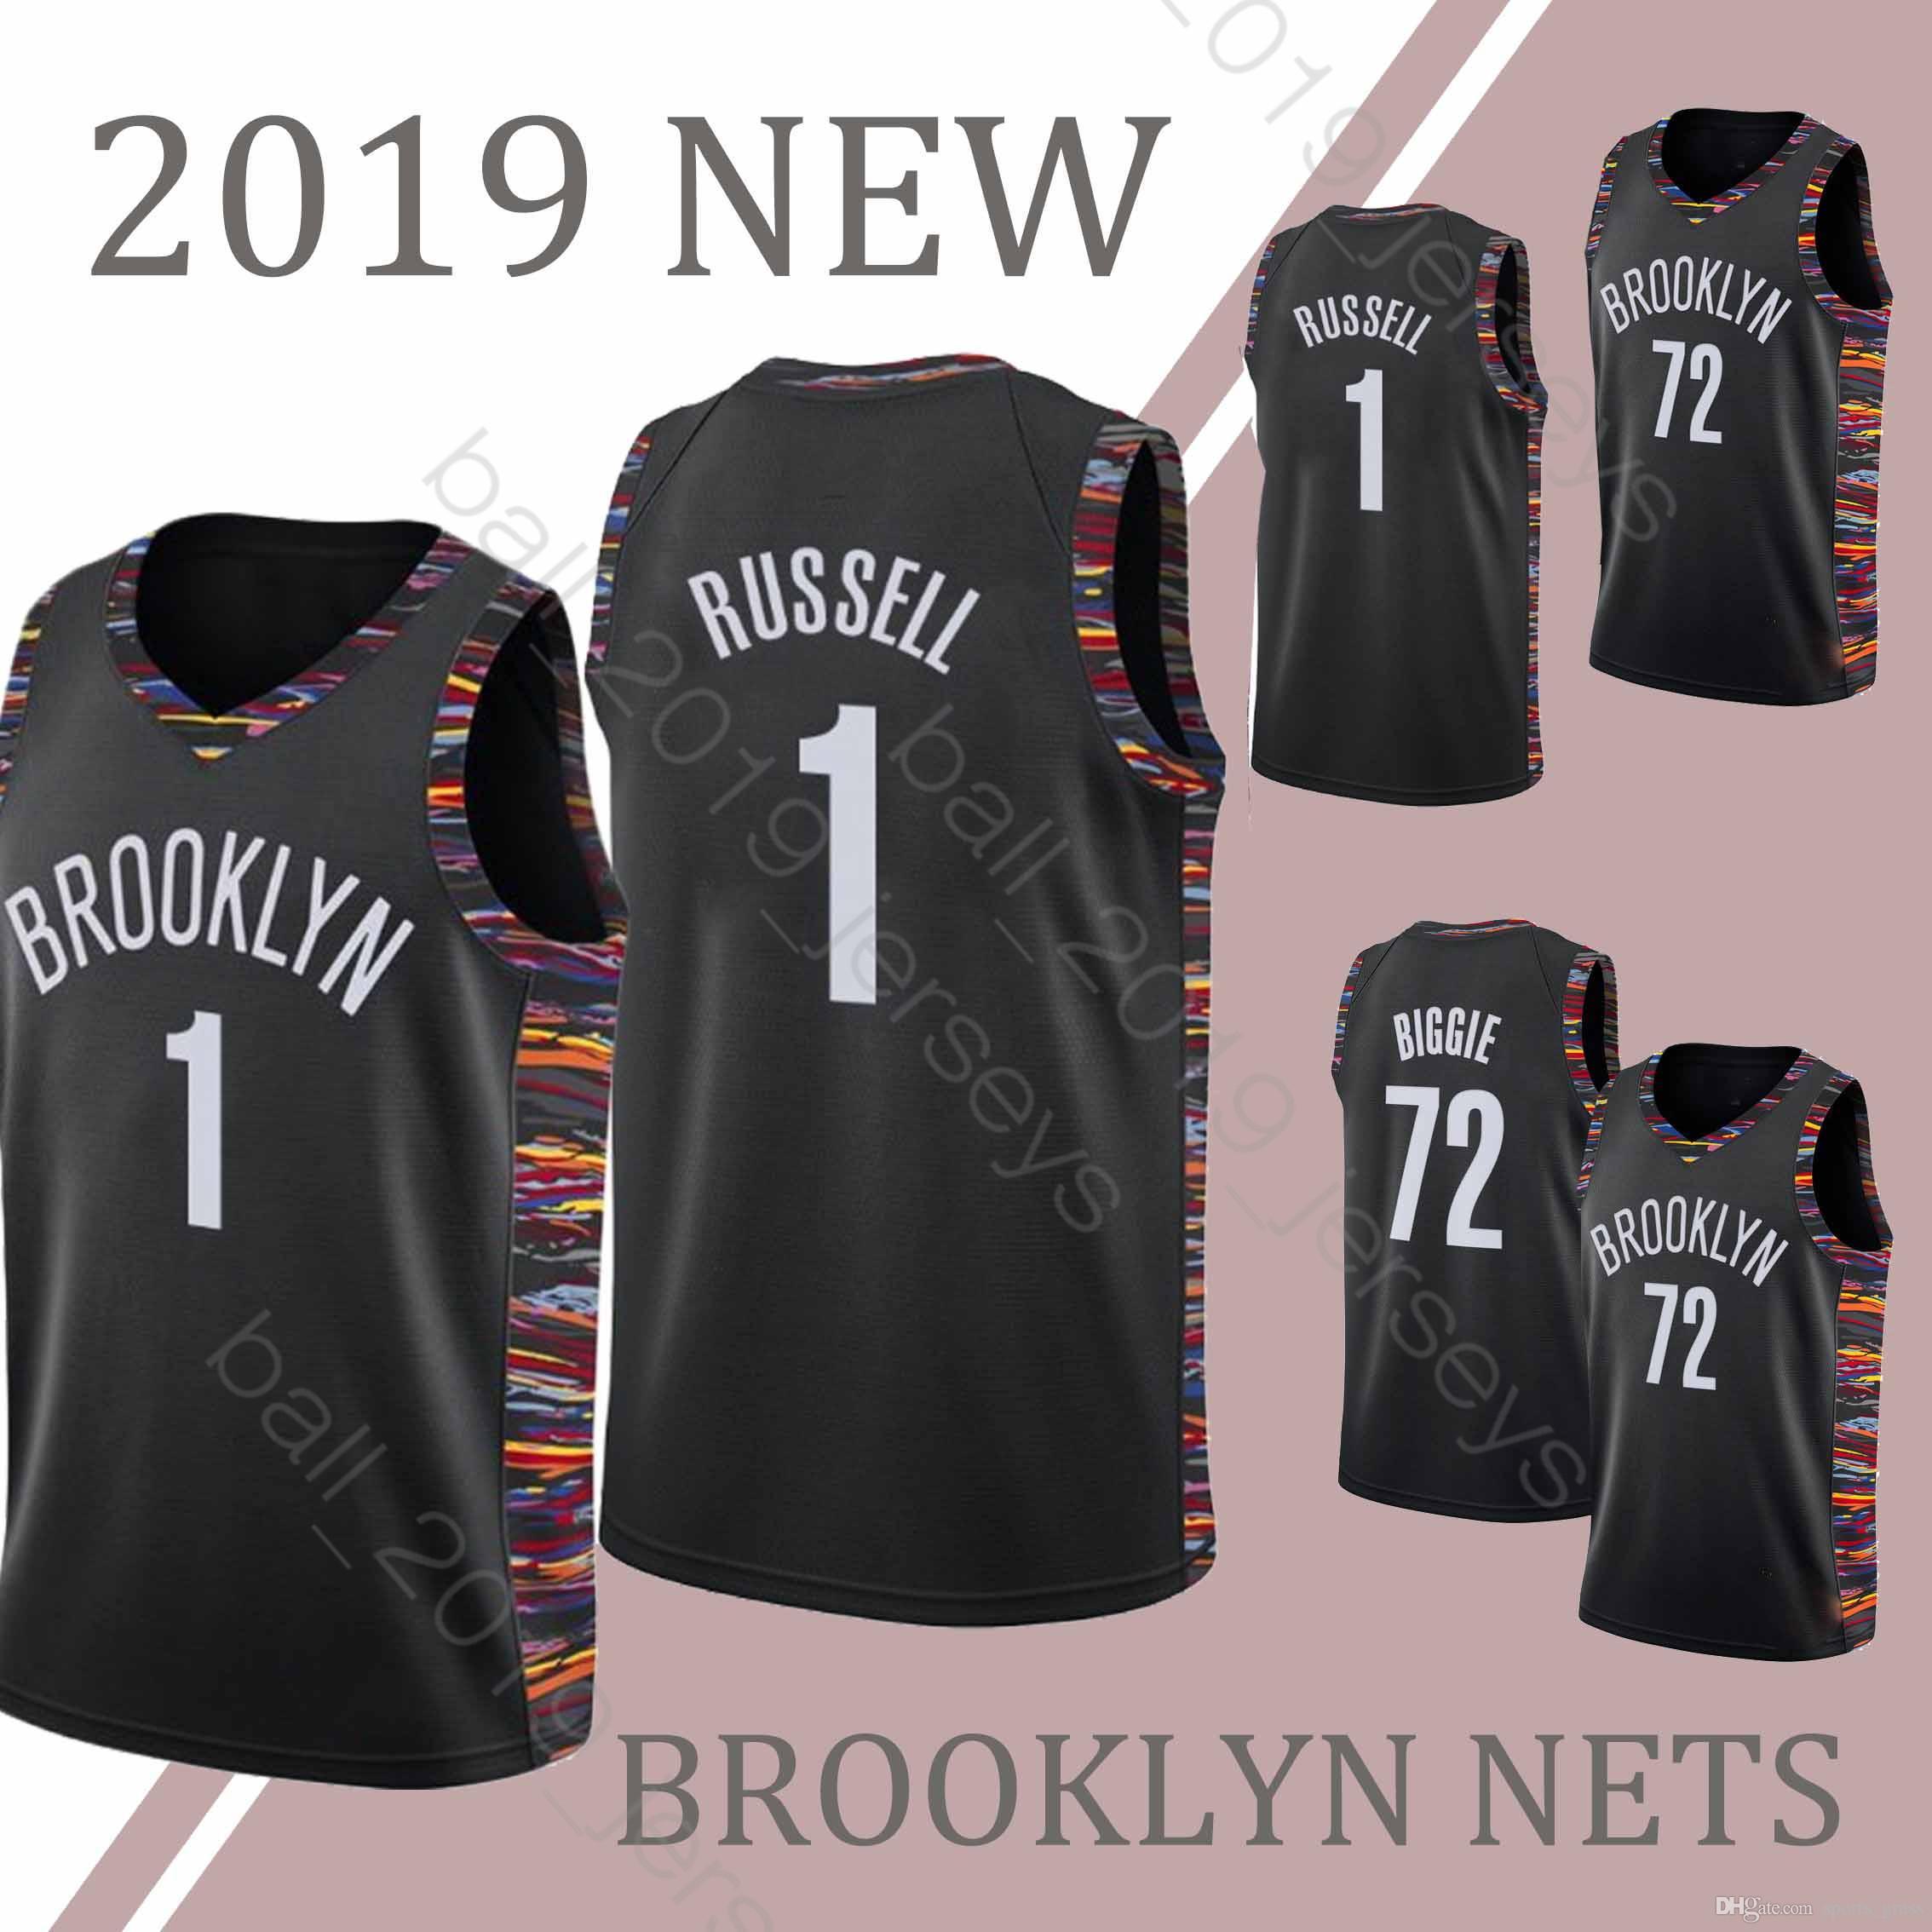 23aa6e312 2019 1 D Angelo Jersey Russell BROOKLYN 72 Black NETS Biggie Jerseys 2019  New HOT SALE Basketball Jerseys From Sports grass